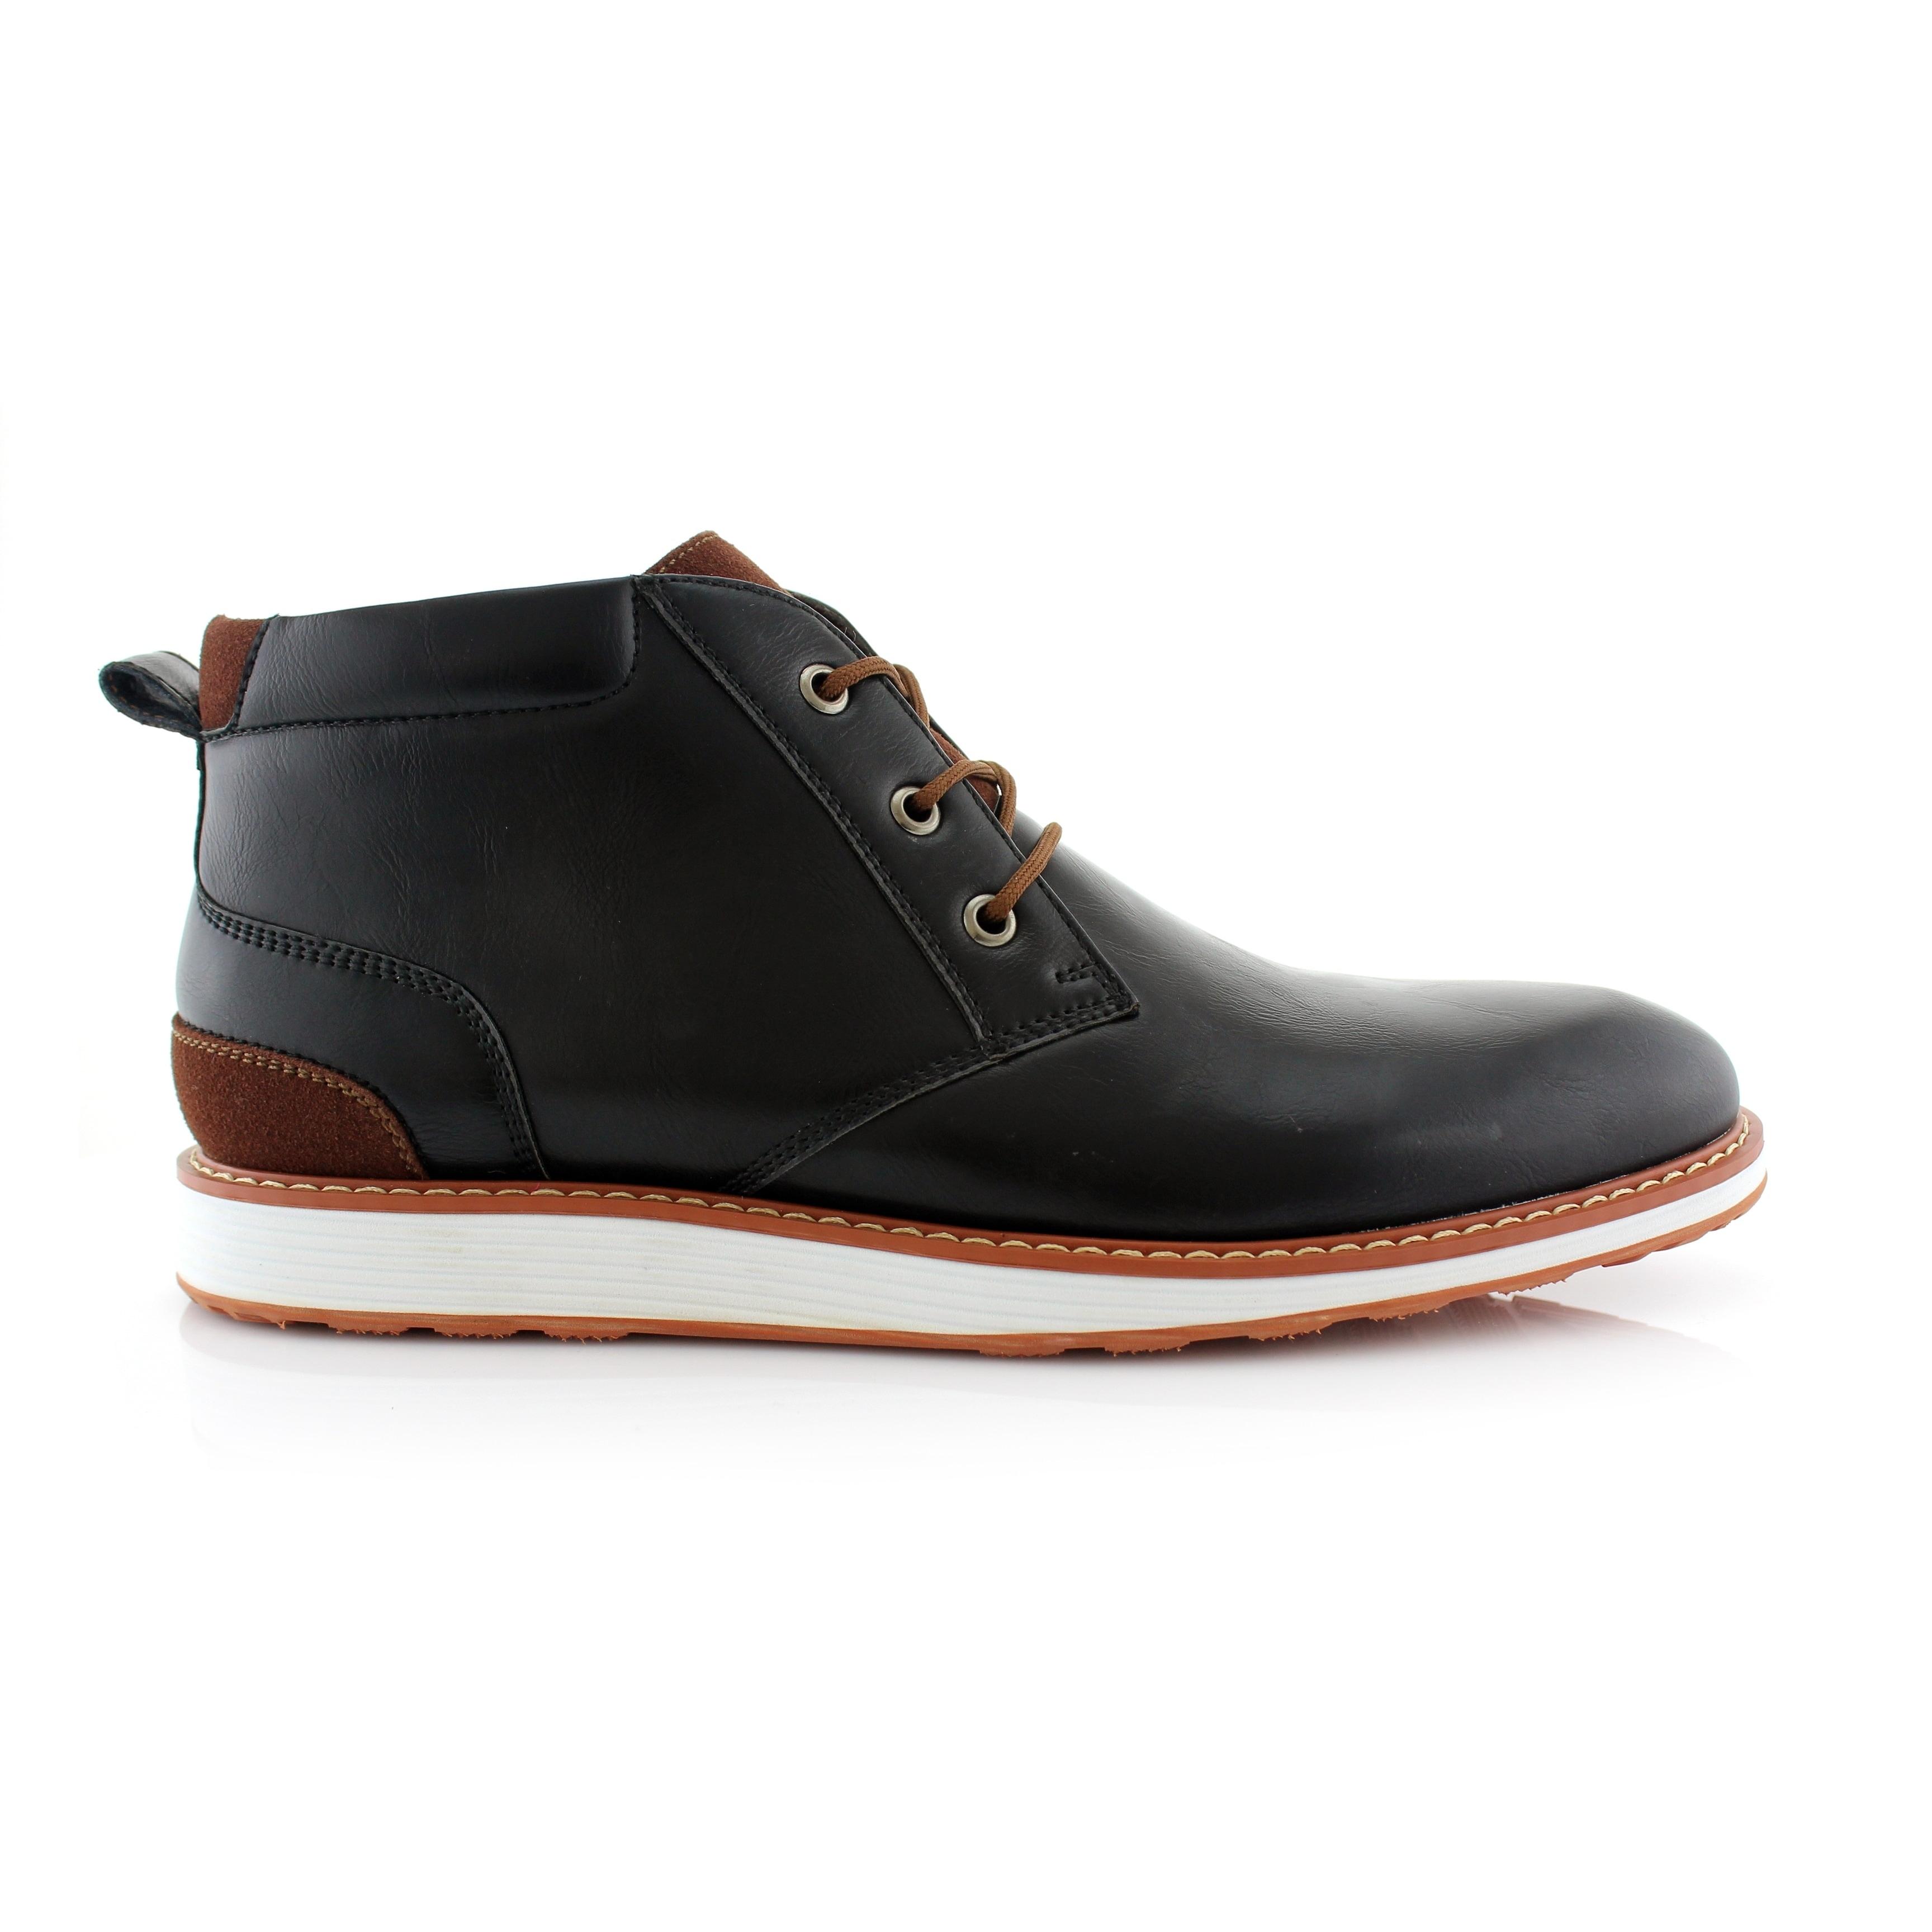 Shop Ferro Aldo Houstan MFA506031 Men's